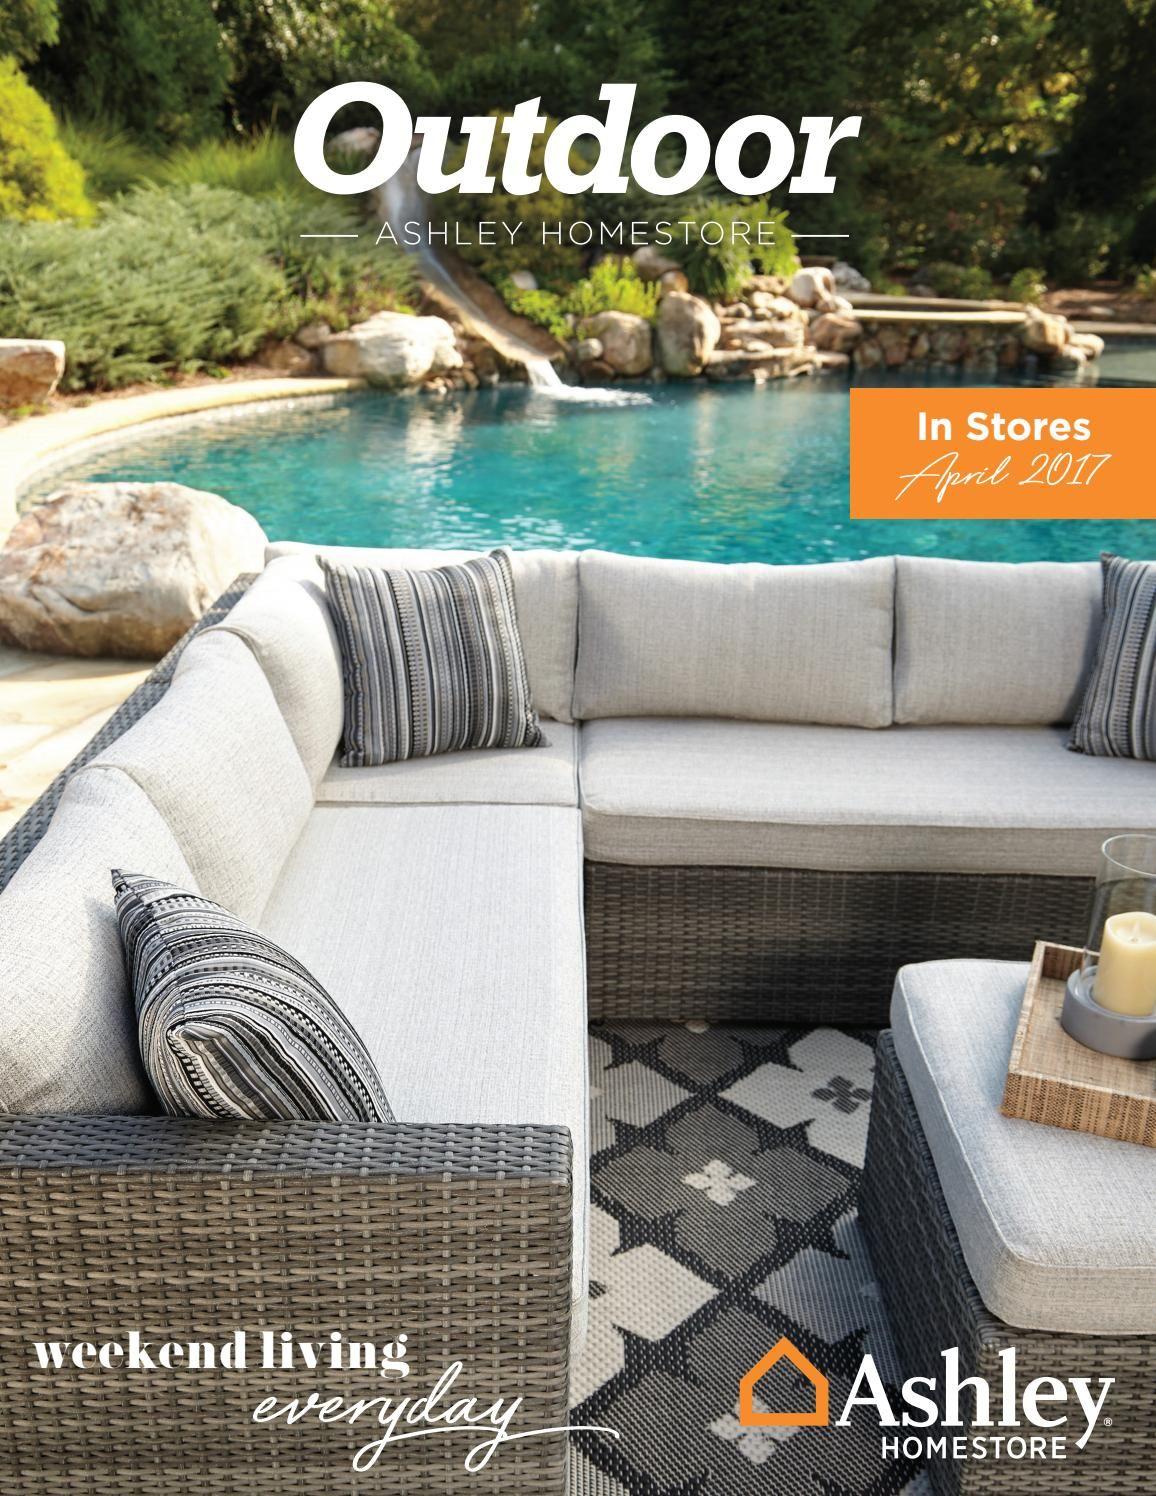 Ashley Homestore Outdoor Lookbook 2017 Outdoor Remodel Best Outdoor Furniture Outdoor Furniture